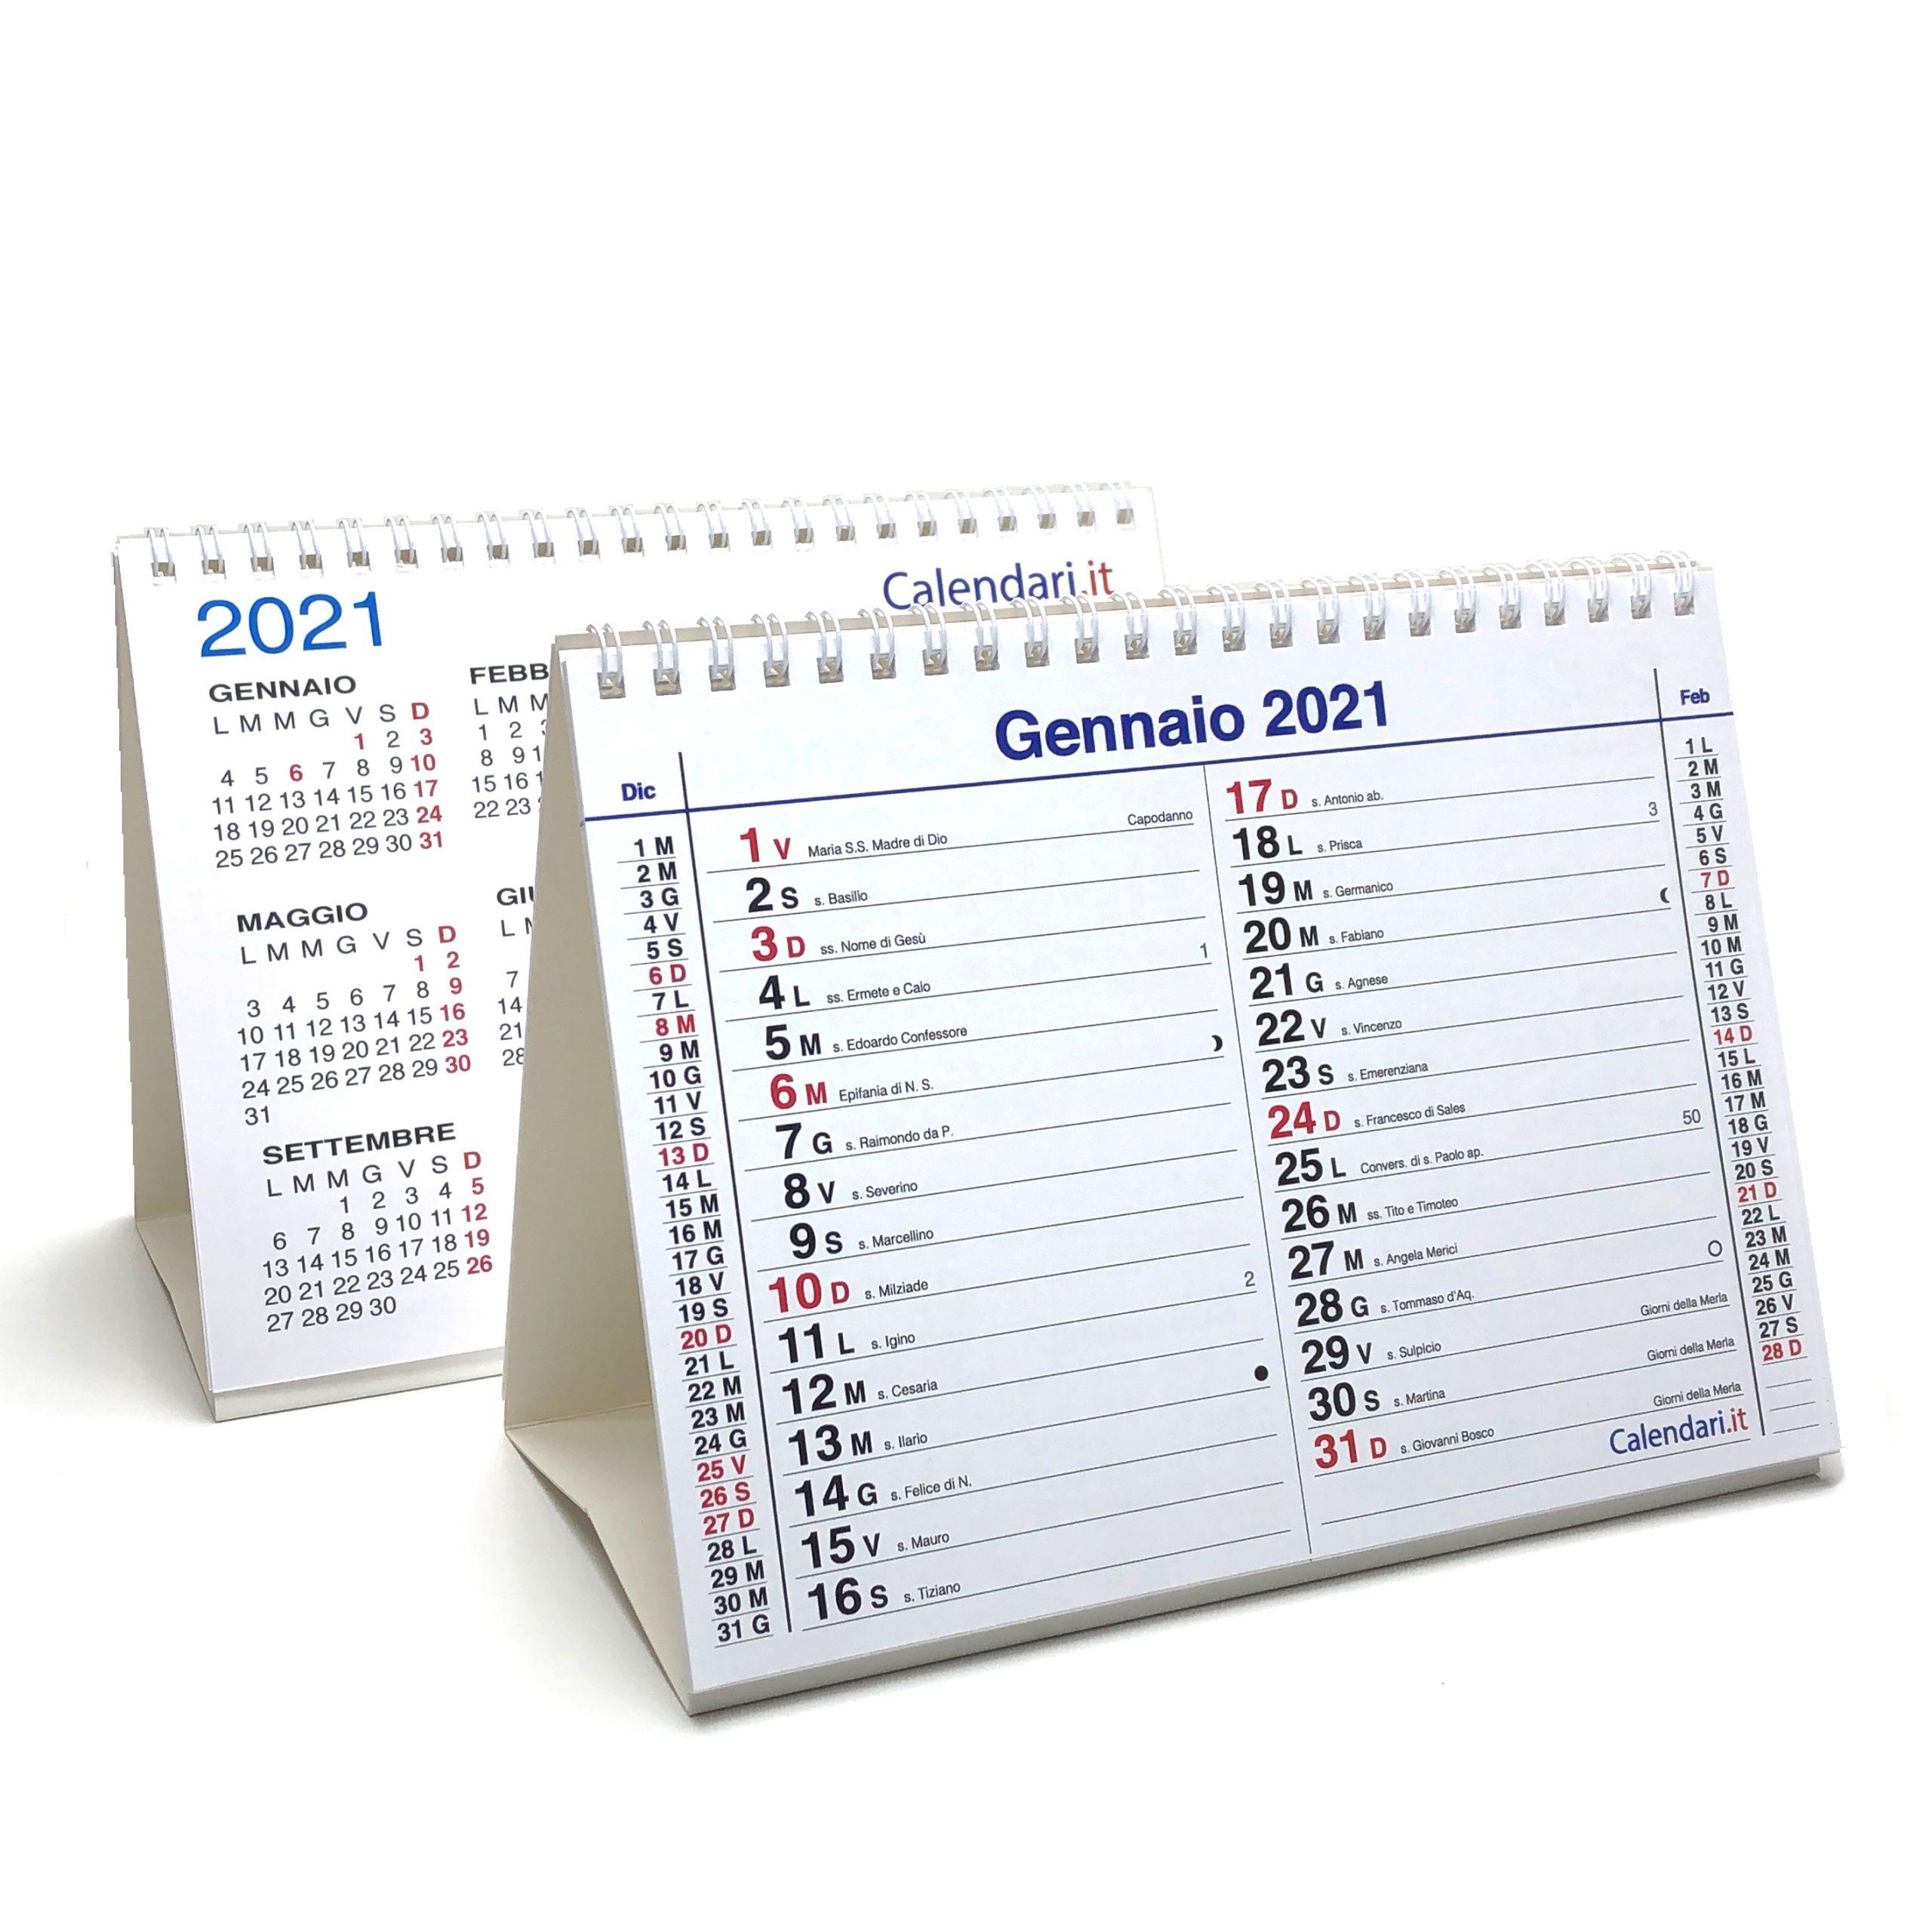 Calendario 2021 tavolo olandese santi e lune 20x15 cm   Calendari